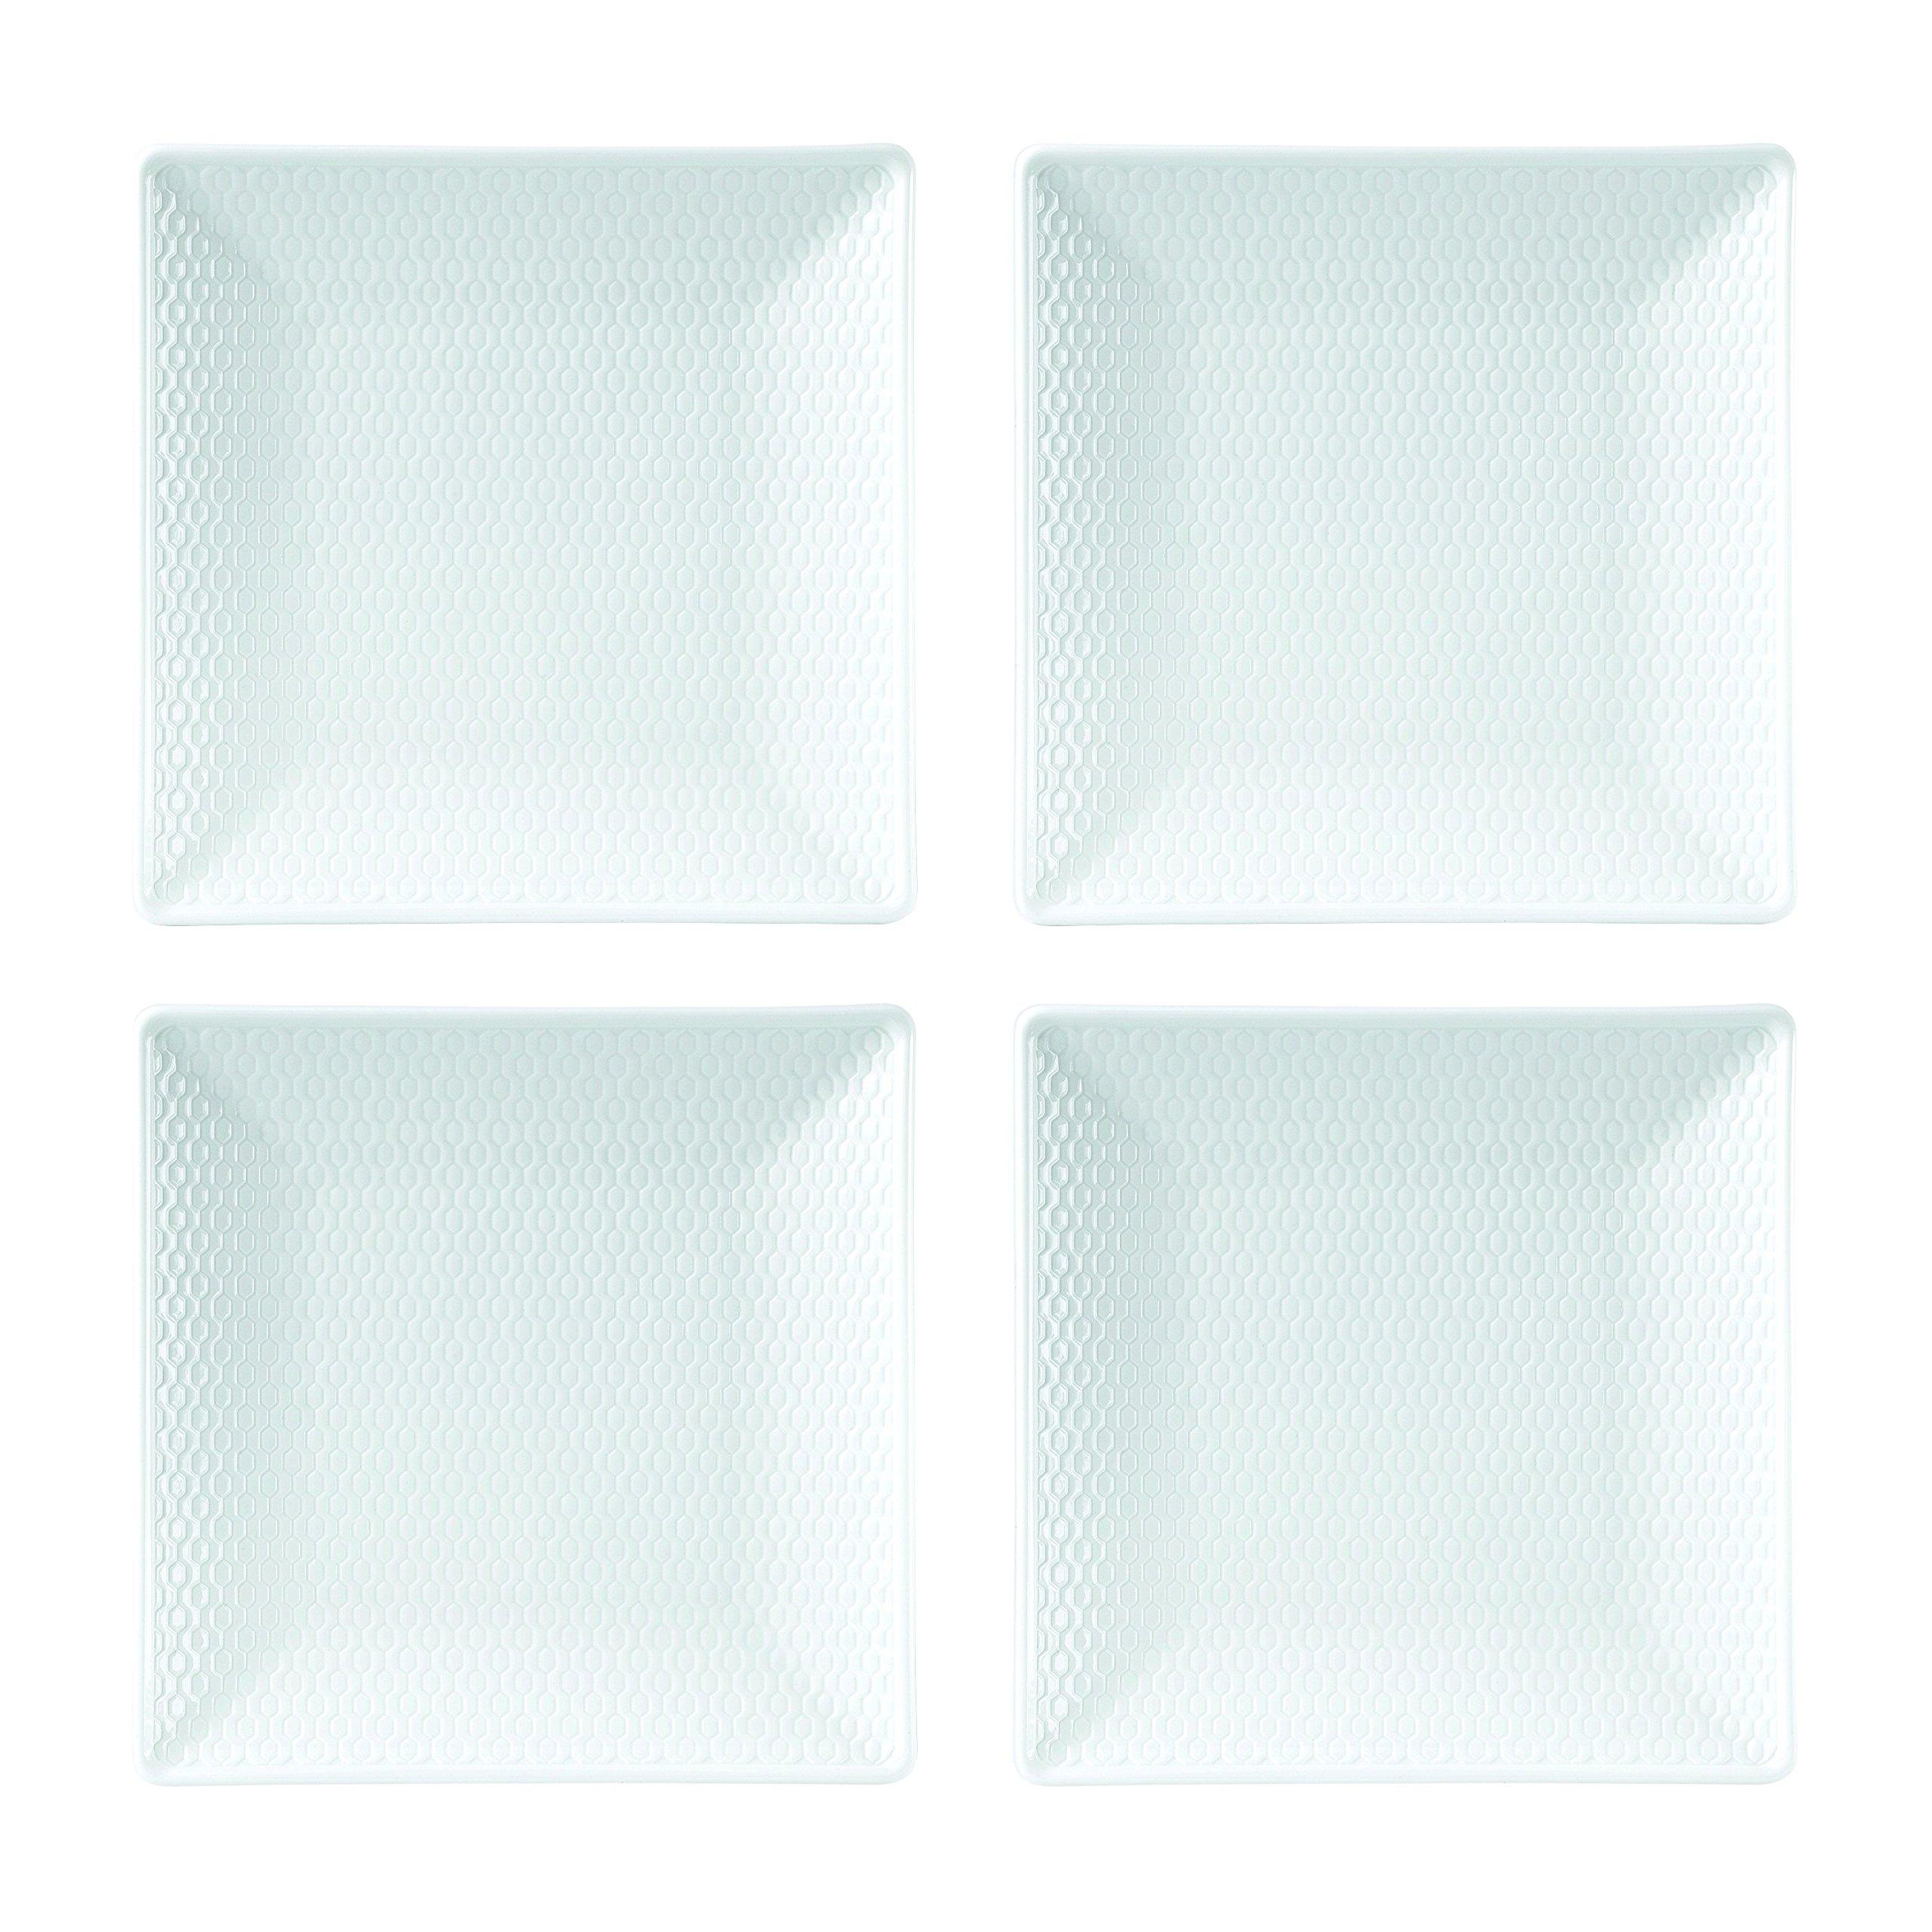 Wedgwood 40023852 Gio Mini Plate Square 5.7'' Set/4, 0.74'', White